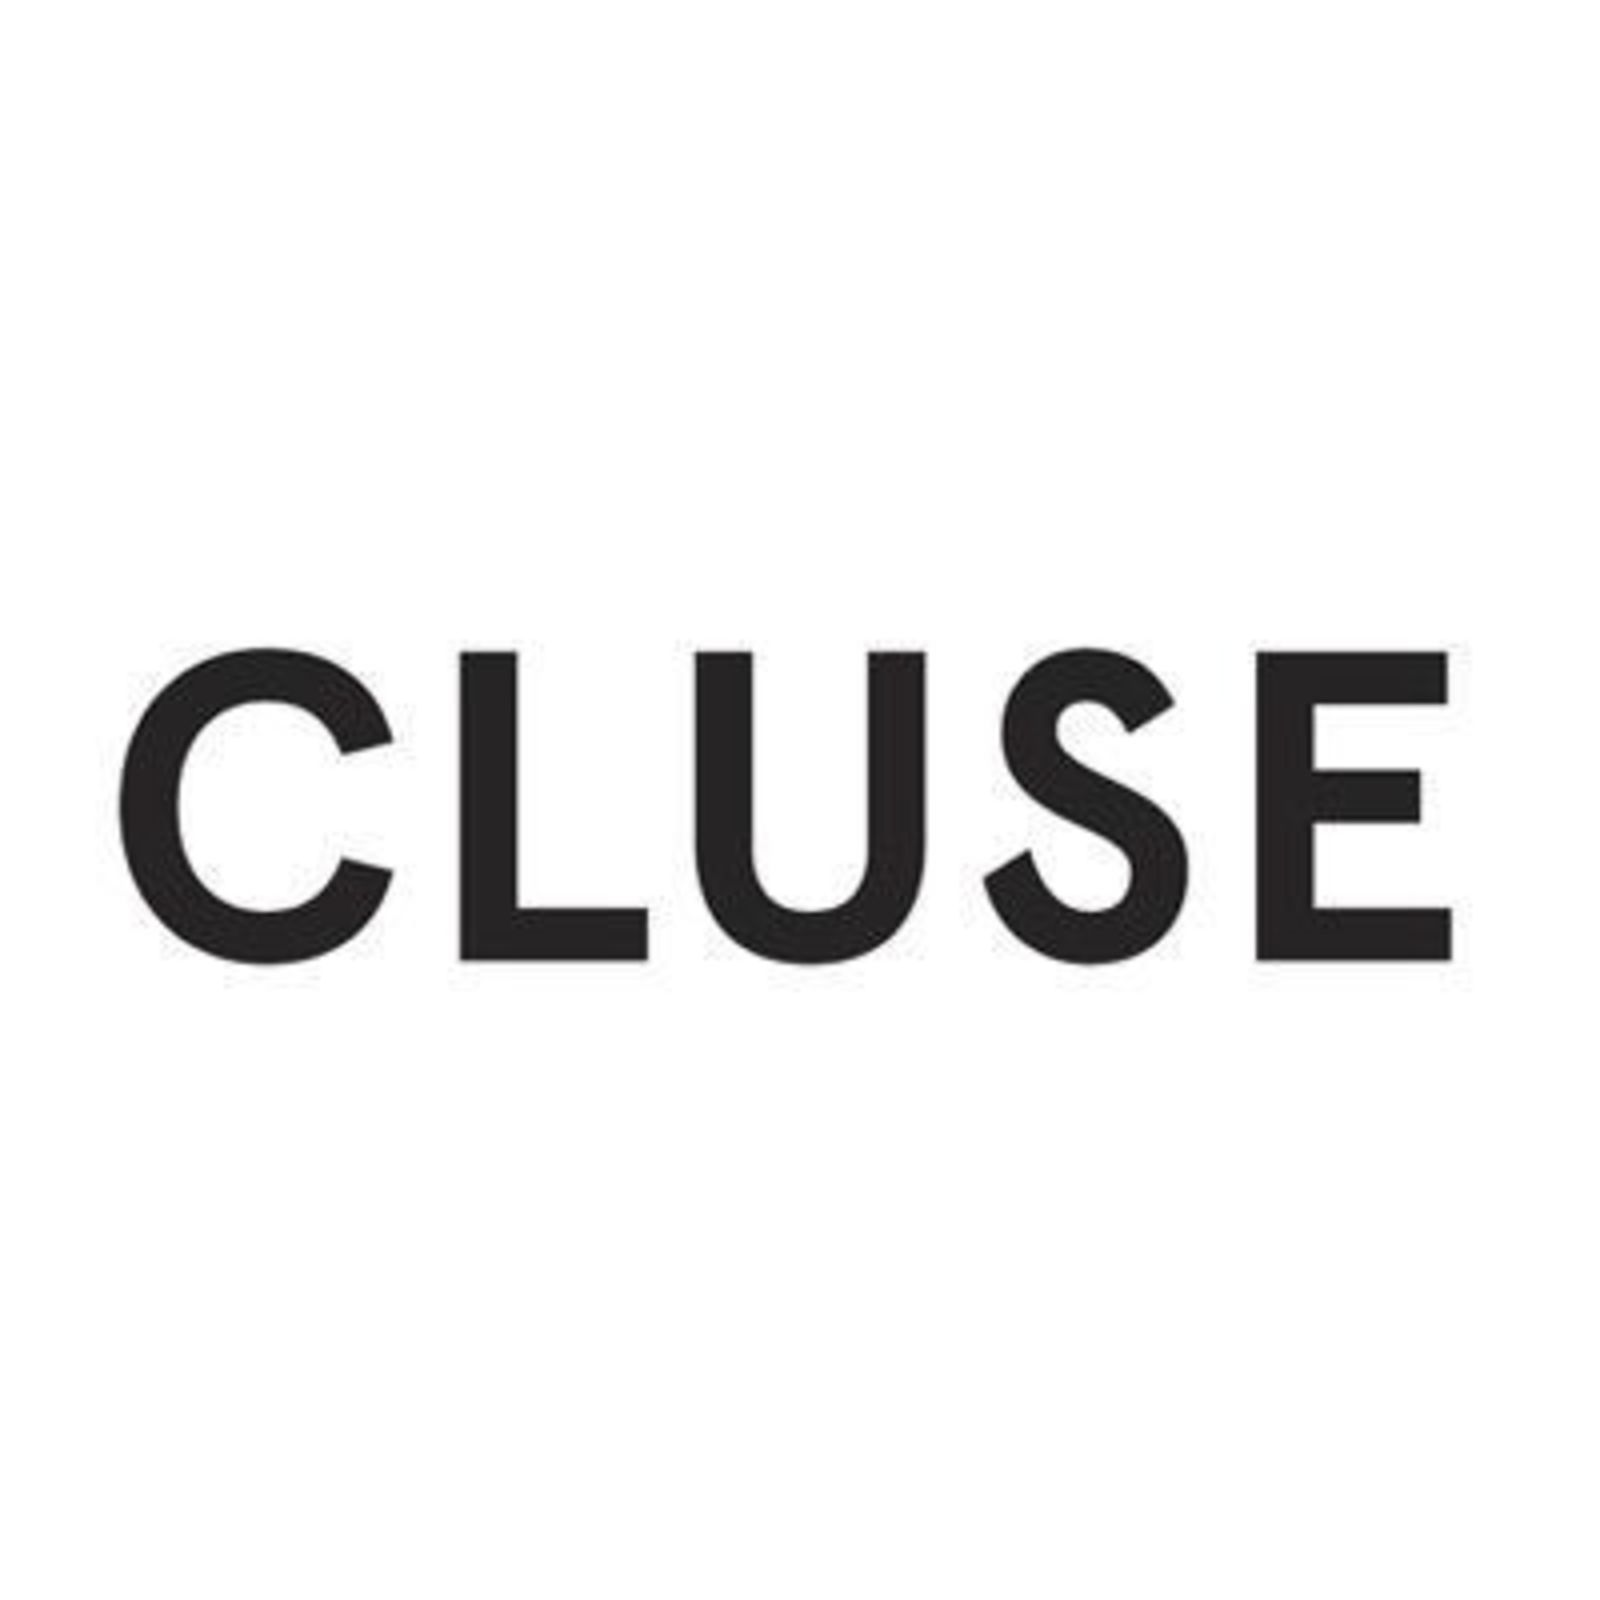 CLUSE (Bild 1)